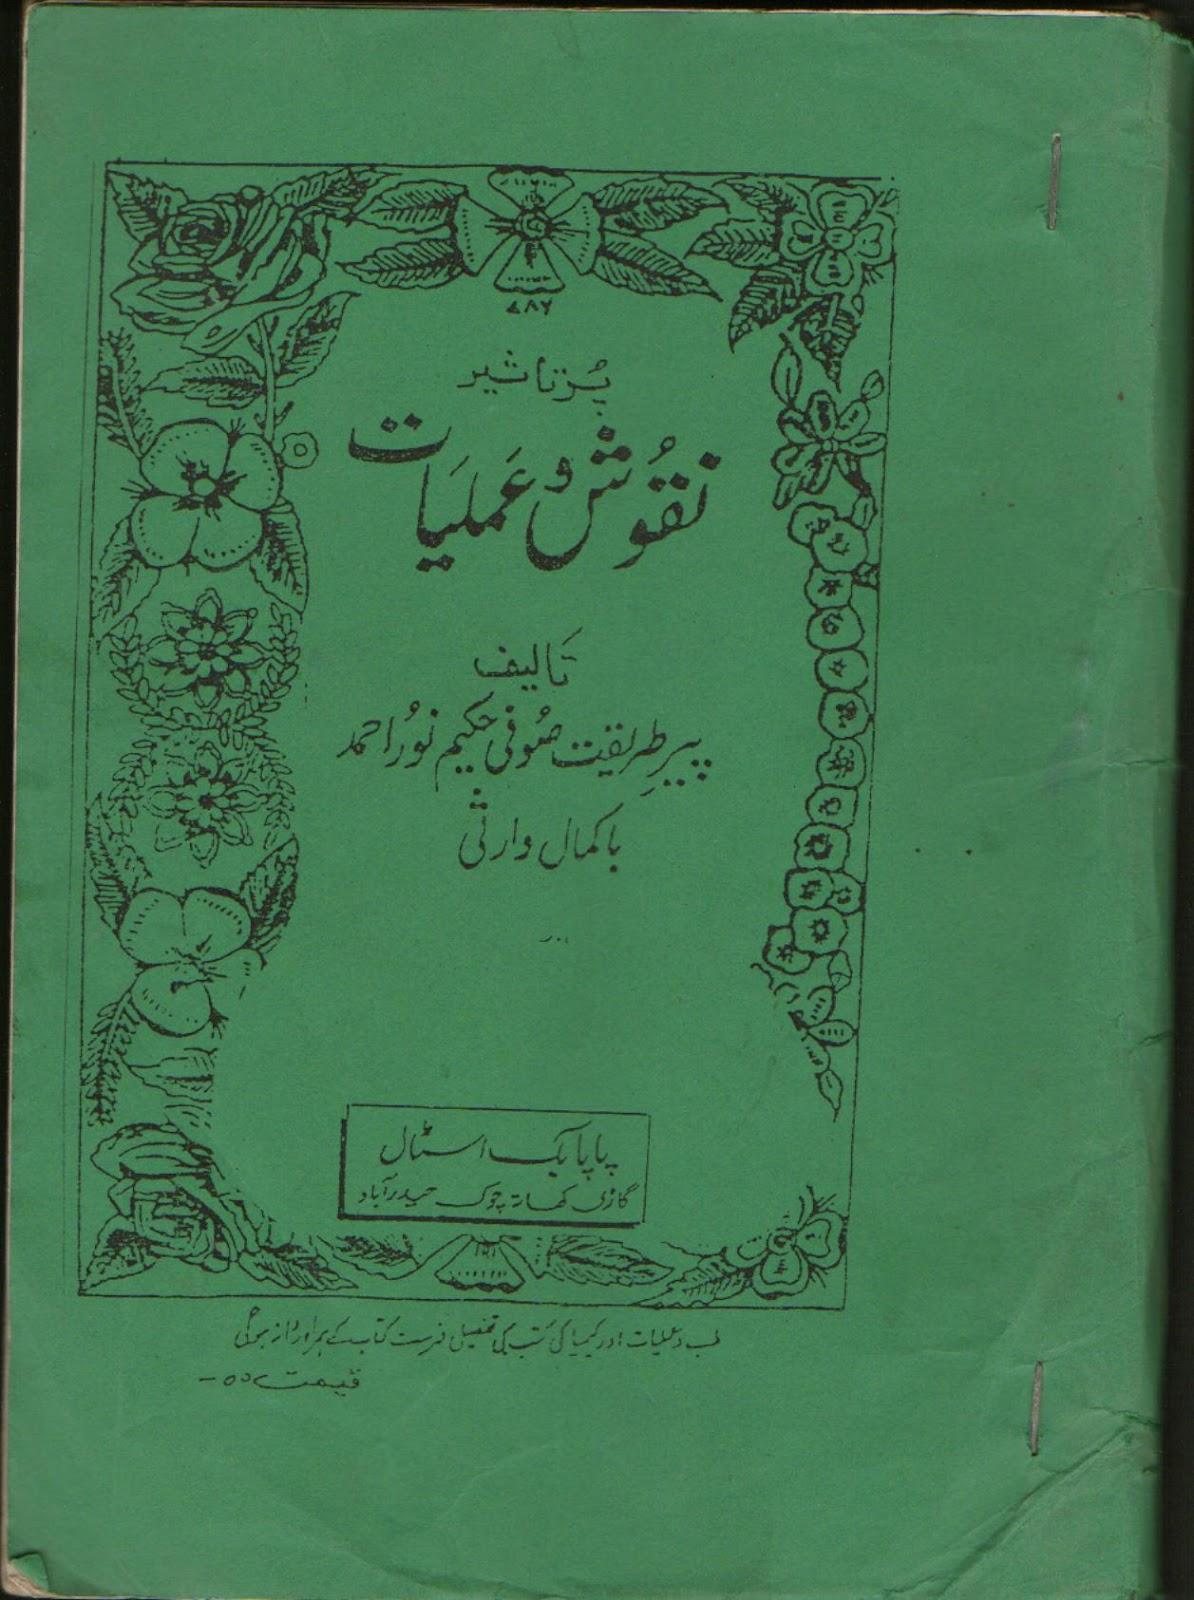 Shan e Ali Book Shop*~* کُتب خانہ شانِ علی*~*